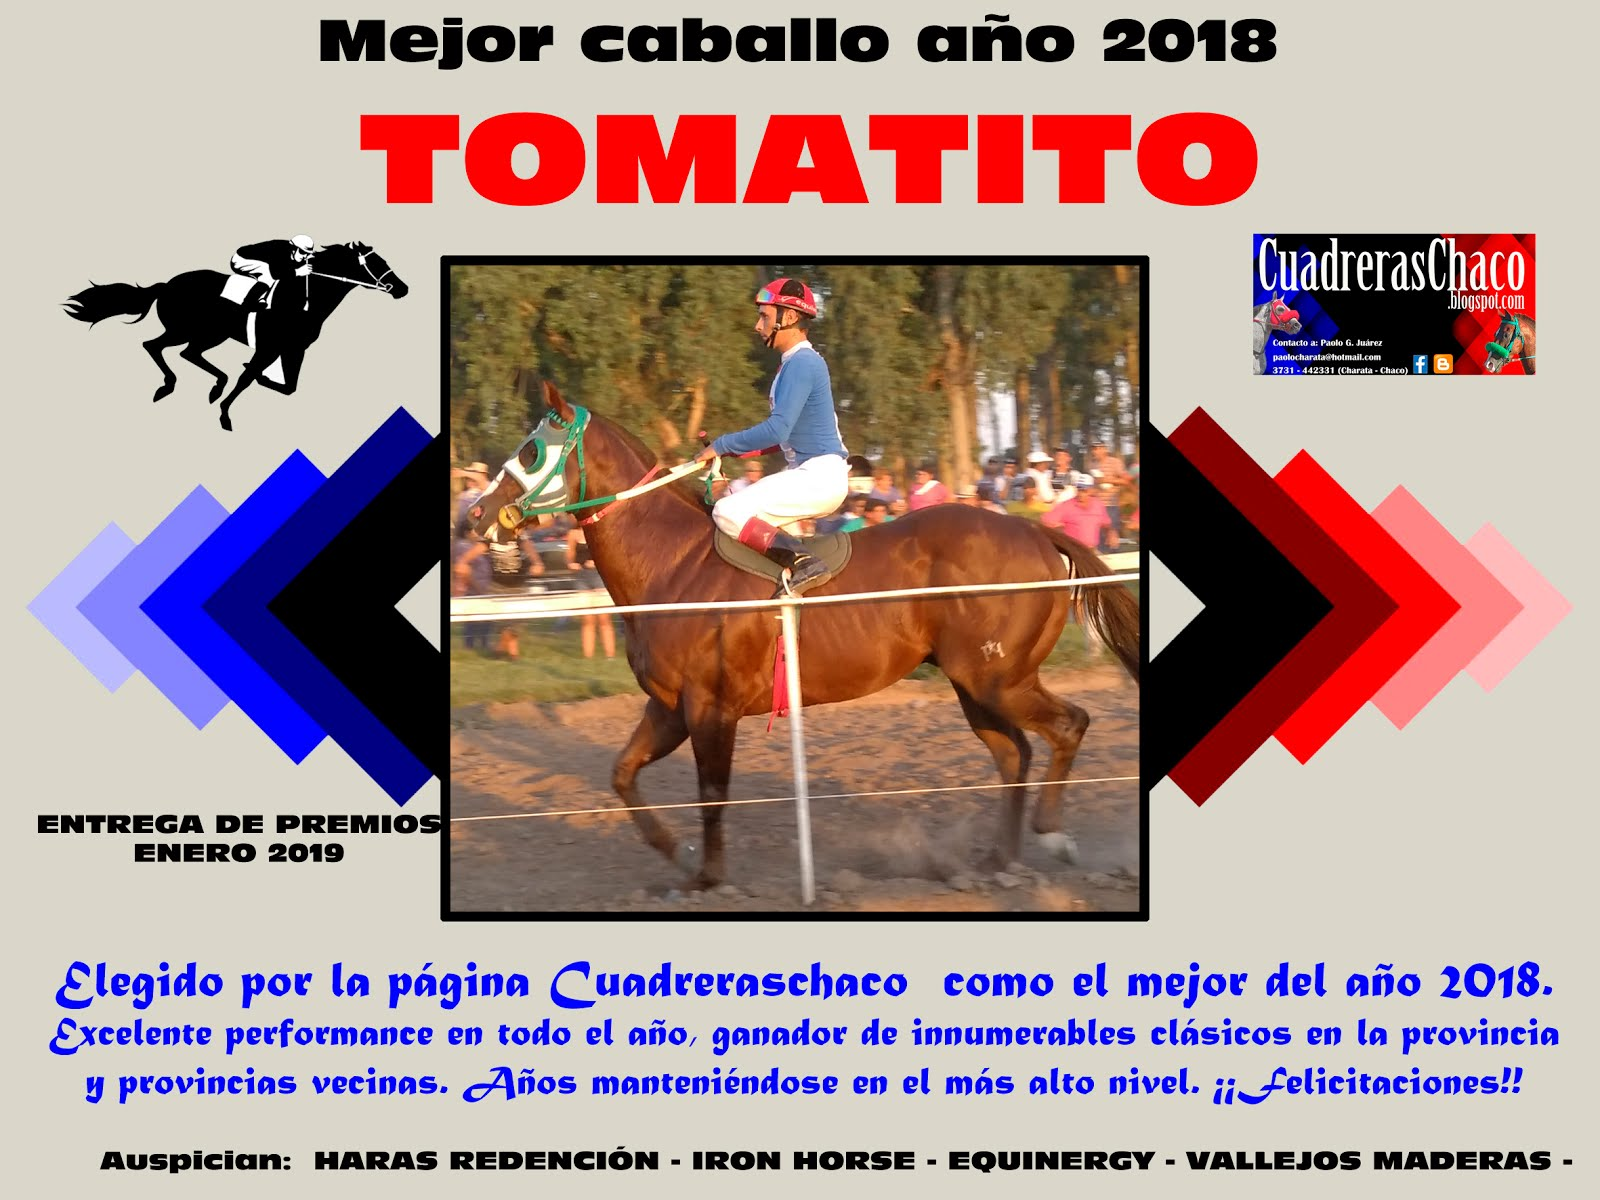 tomatito mejor 2018